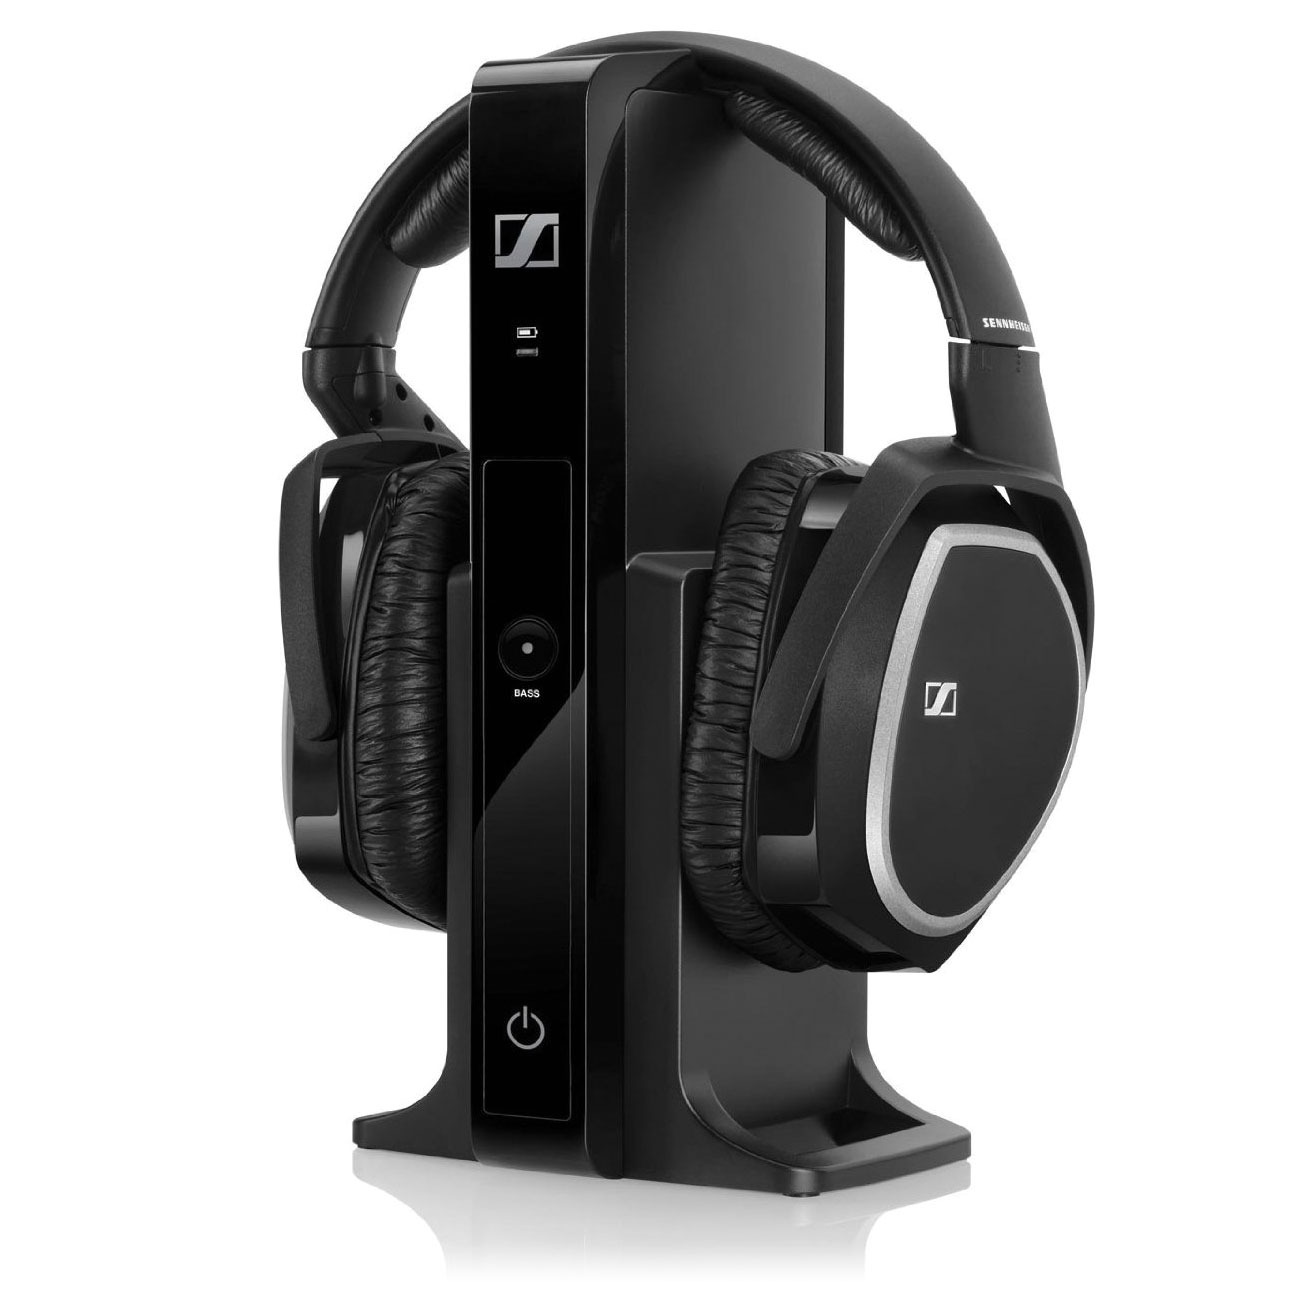 Sennheiser Rs 165 Tv Digital Wireless Headset Headphones